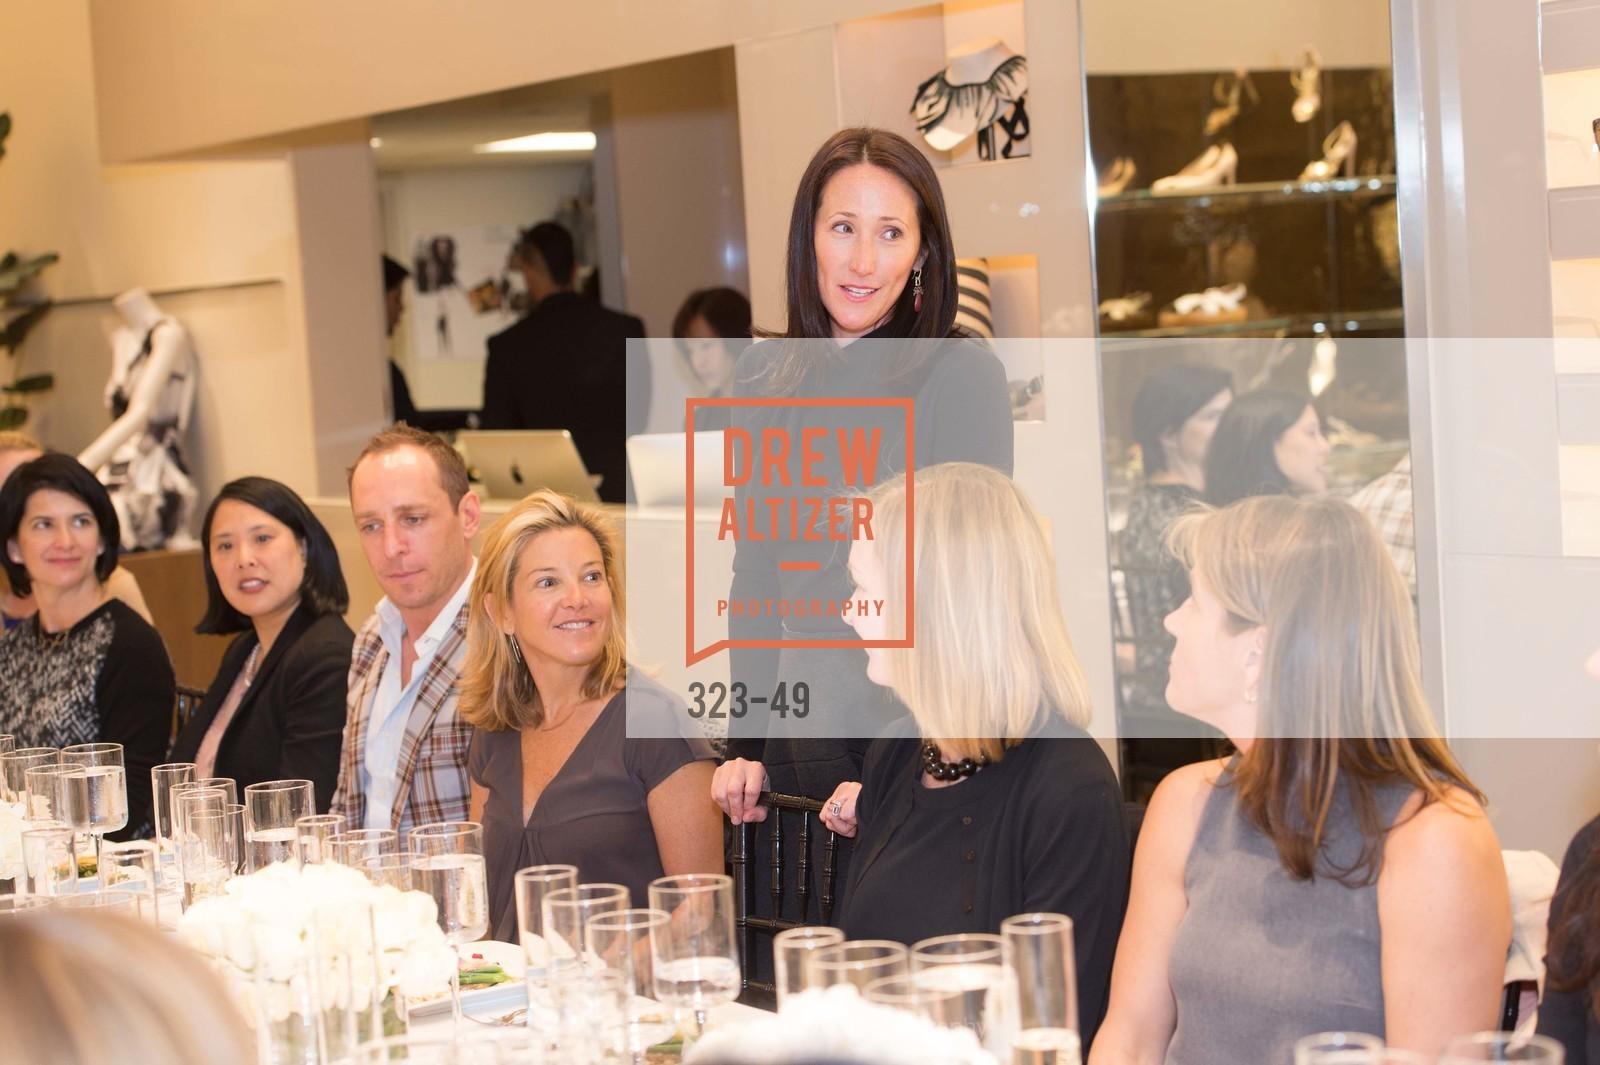 Kathryn Freeman, Luncheon Hosted by Max Mara, Max Mara. 175 Post St, San Francisco, CA 94108, April 21st, 2015,Drew Altizer, Drew Altizer Photography, full-service event agency, private events, San Francisco photographer, photographer California